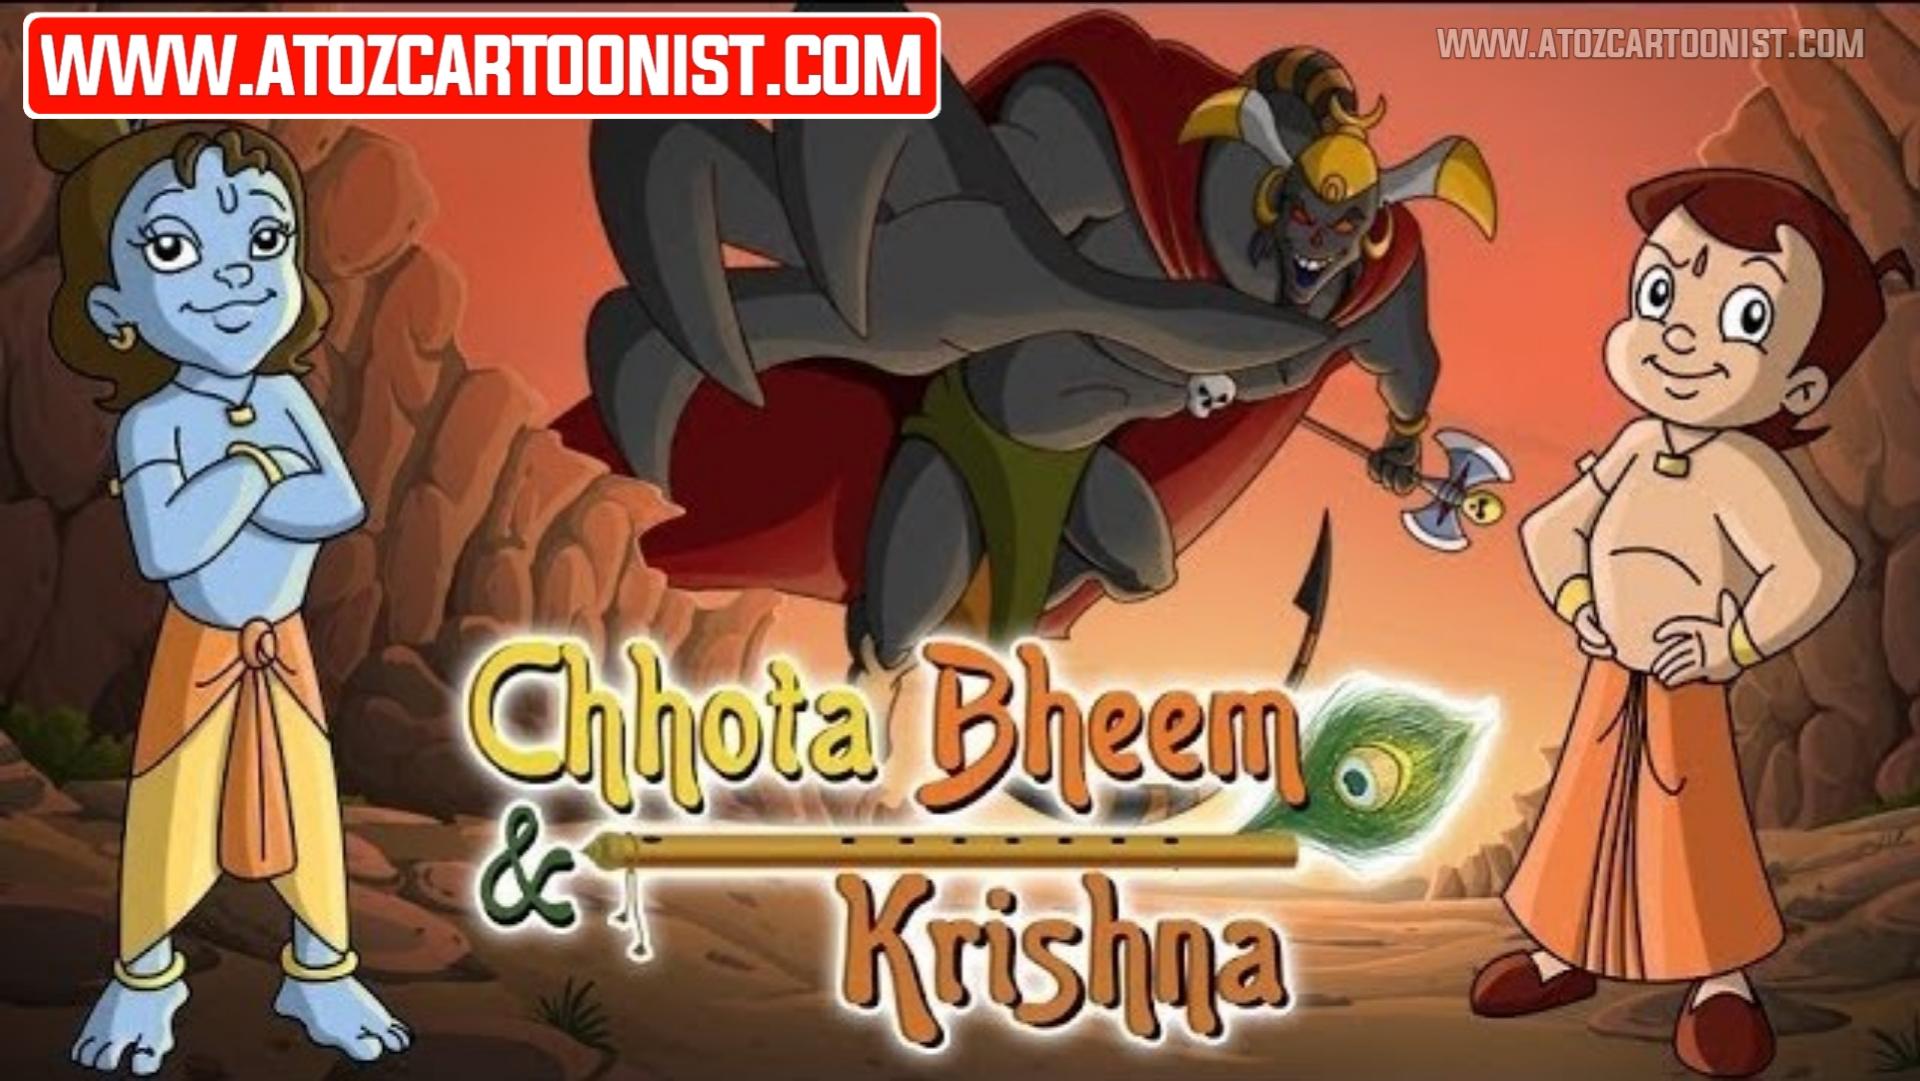 CHHOTA BHEEM AUR KRISHNA (2008) FULL MOVIE IN HINDI & TAMIL DOWNLOAD (480P & 1080P)